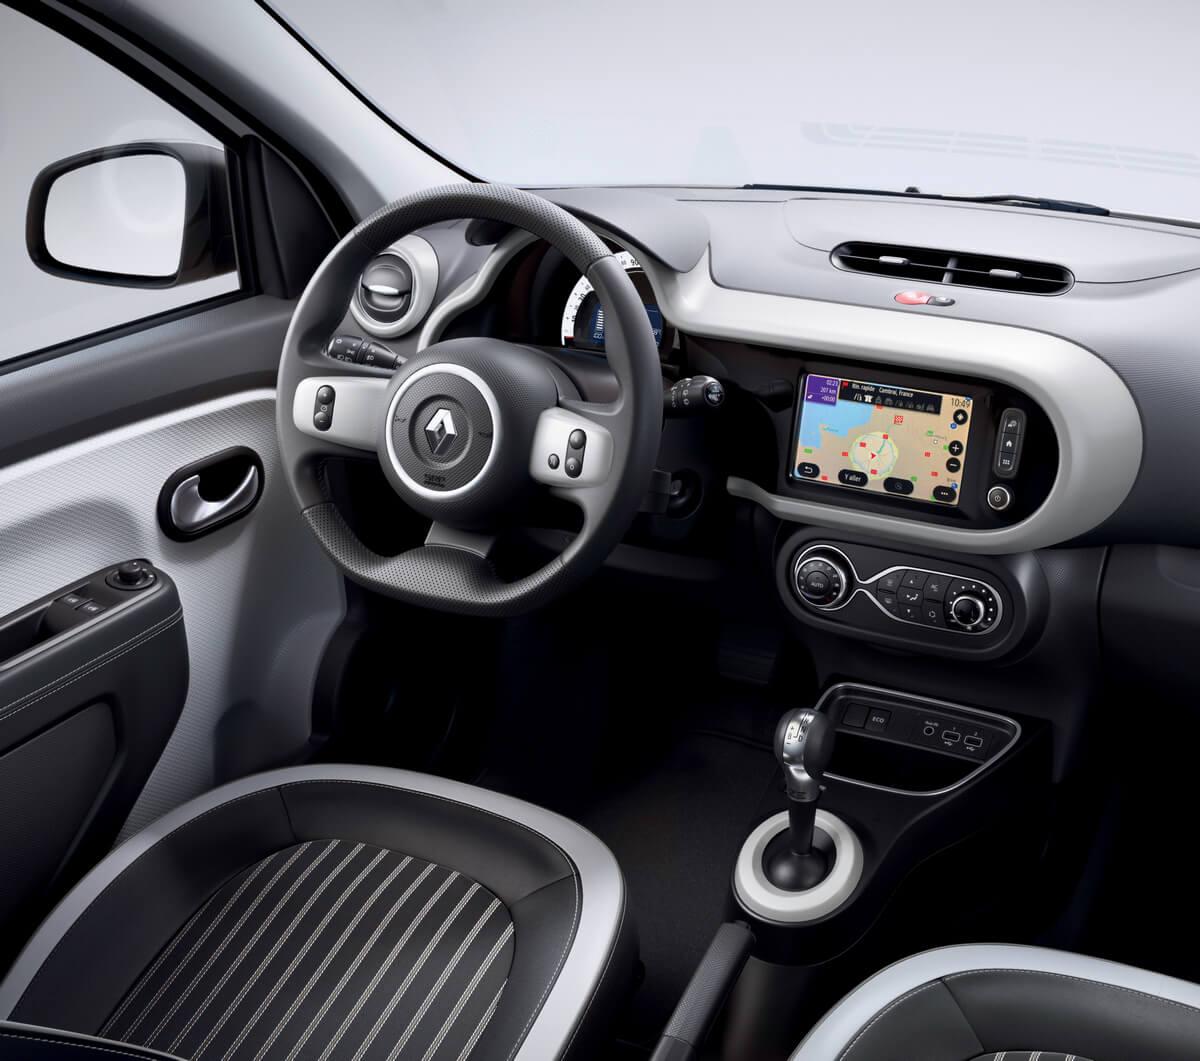 Renault Twingo ZE 22 kWh Interior